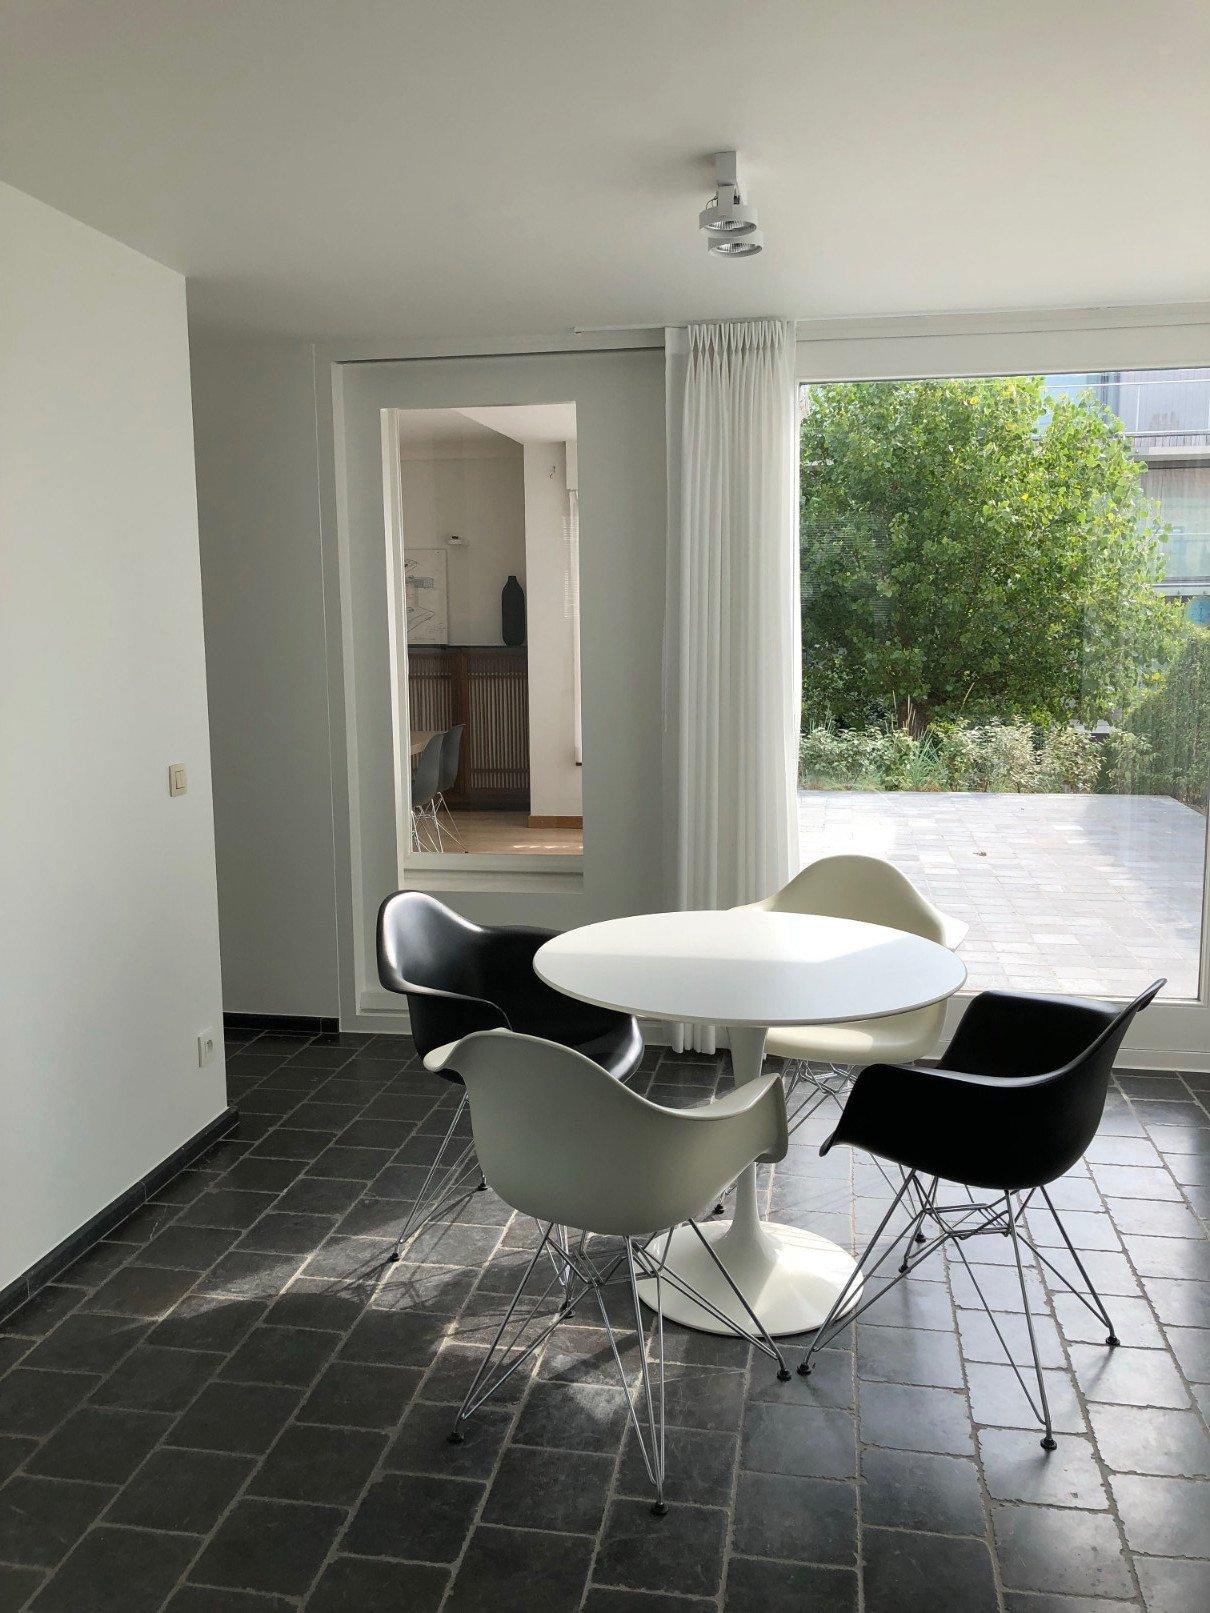 Rietveldprojects-Villa Were Di - Te Koop : Te Huur (per week)29.jpg